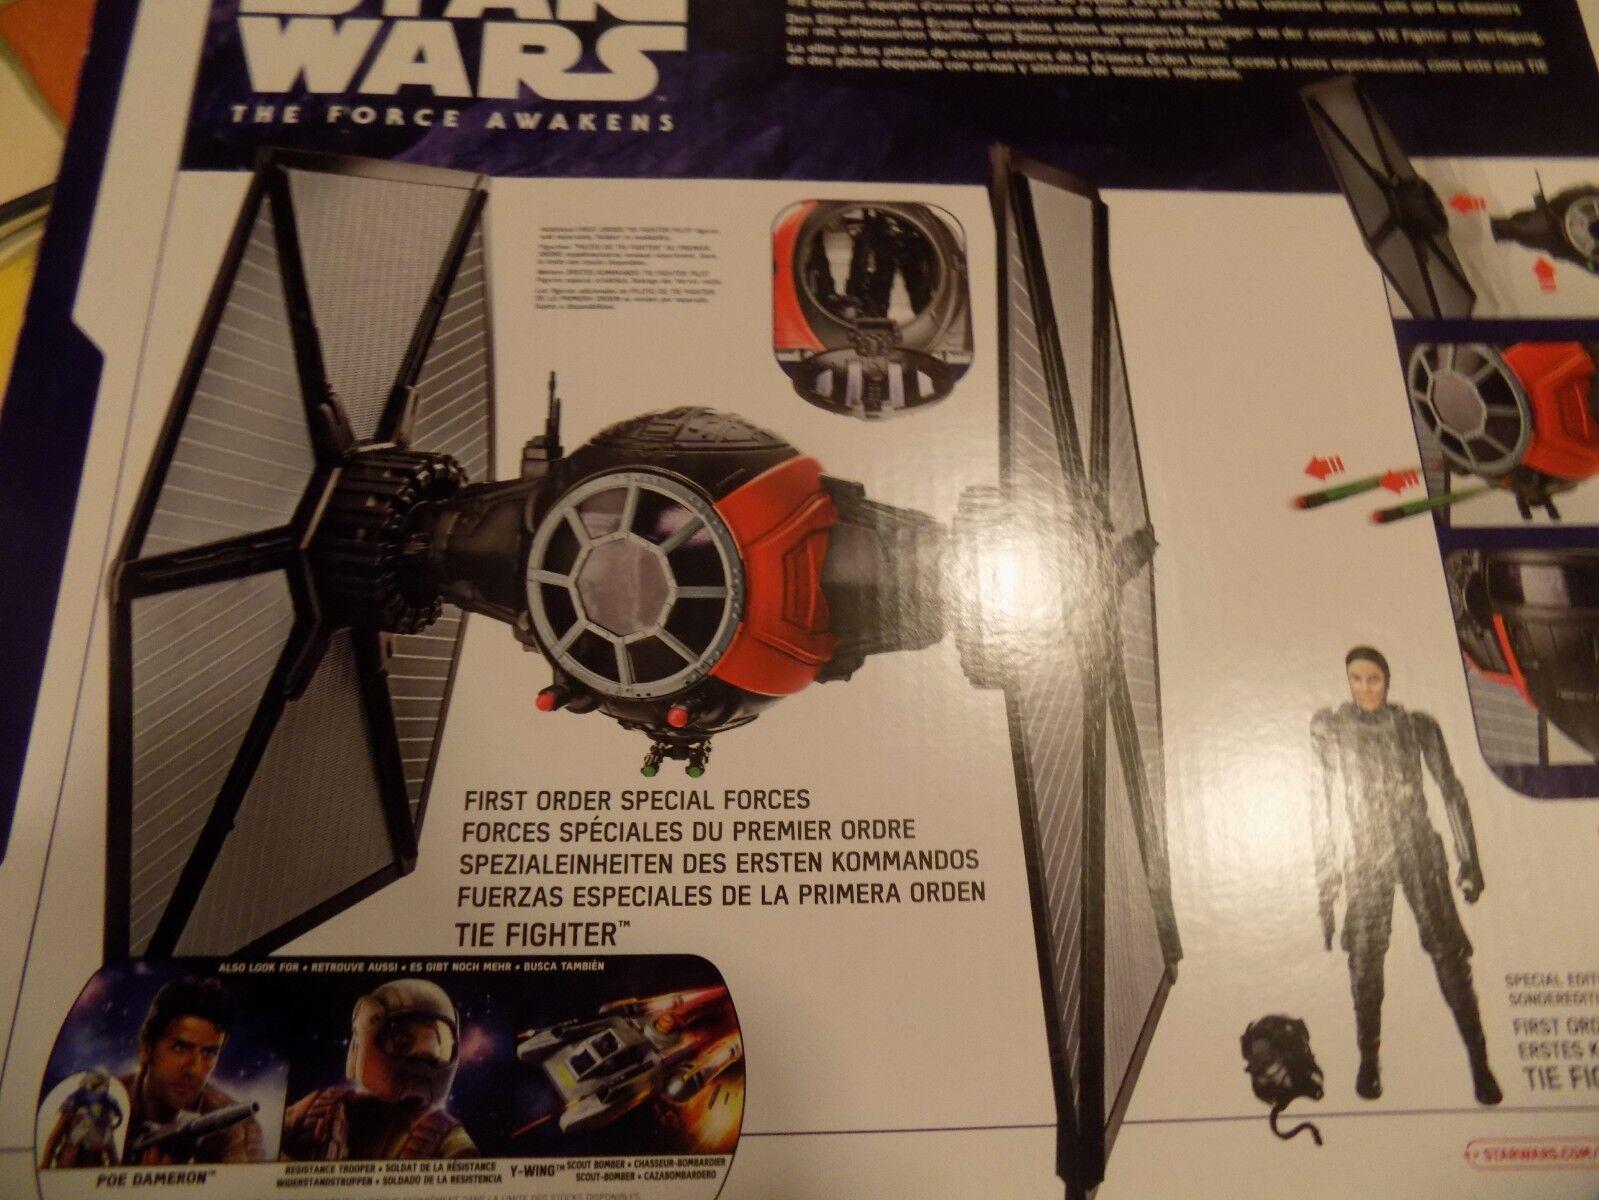 Star Wars Cadeau Noel NEUF Soldé Moitié Prix TIE FIGHTER + PILOTE star wars NEUF